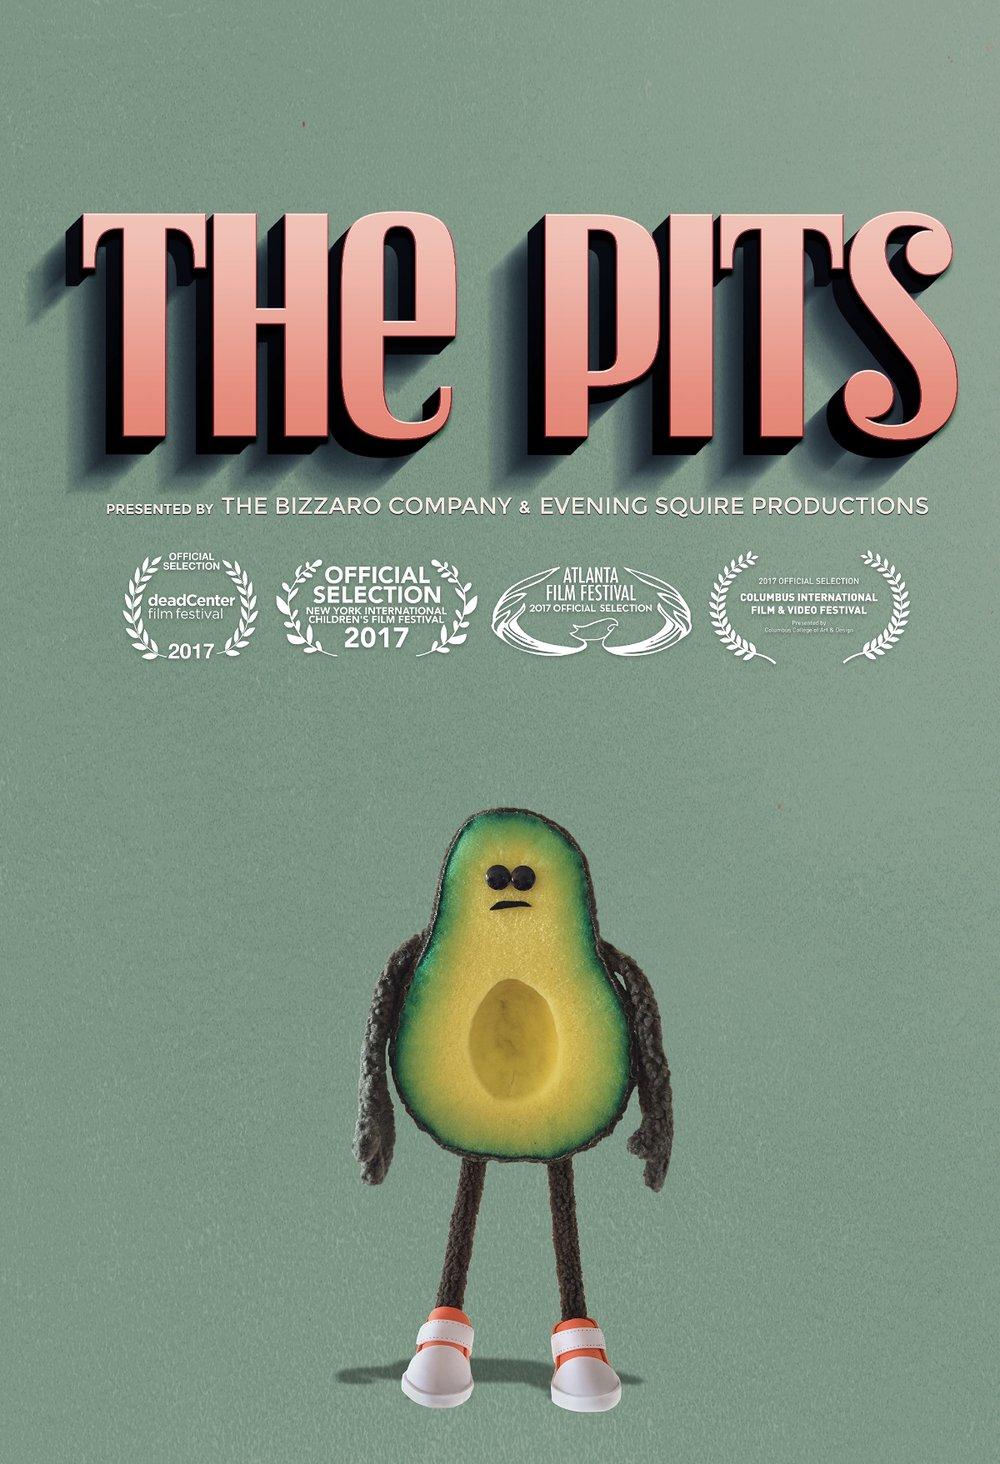 The Pits IMDB Image 02_72 DPI.jpg